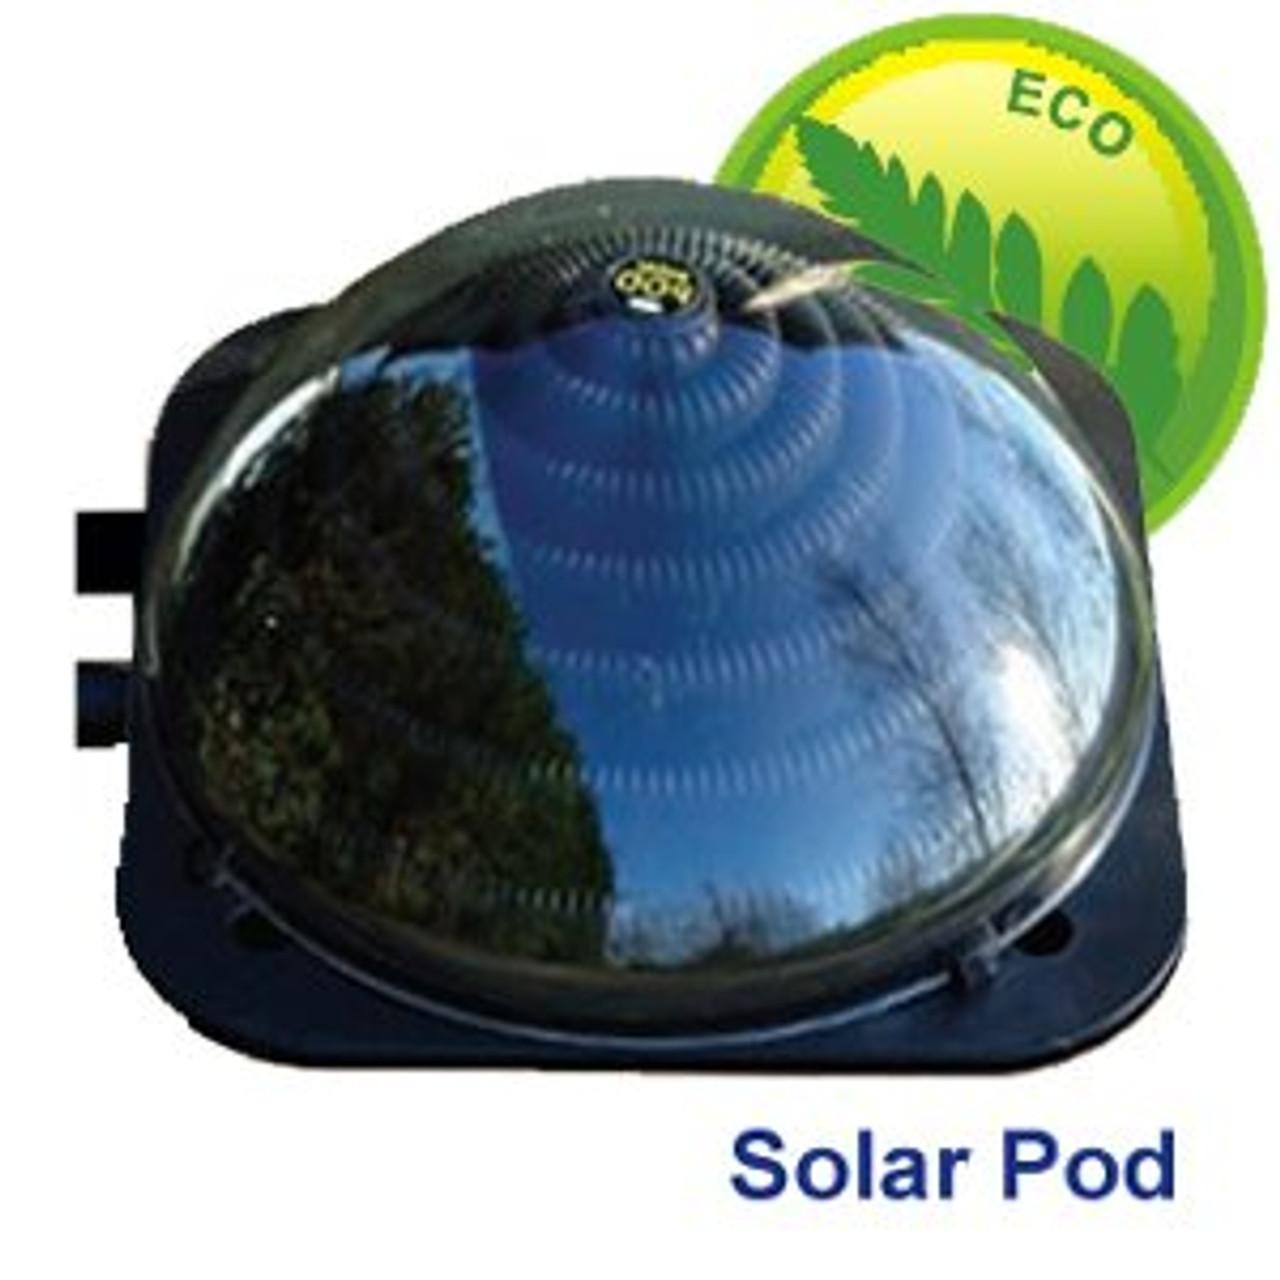 Swimming Pool solar heater eco pod